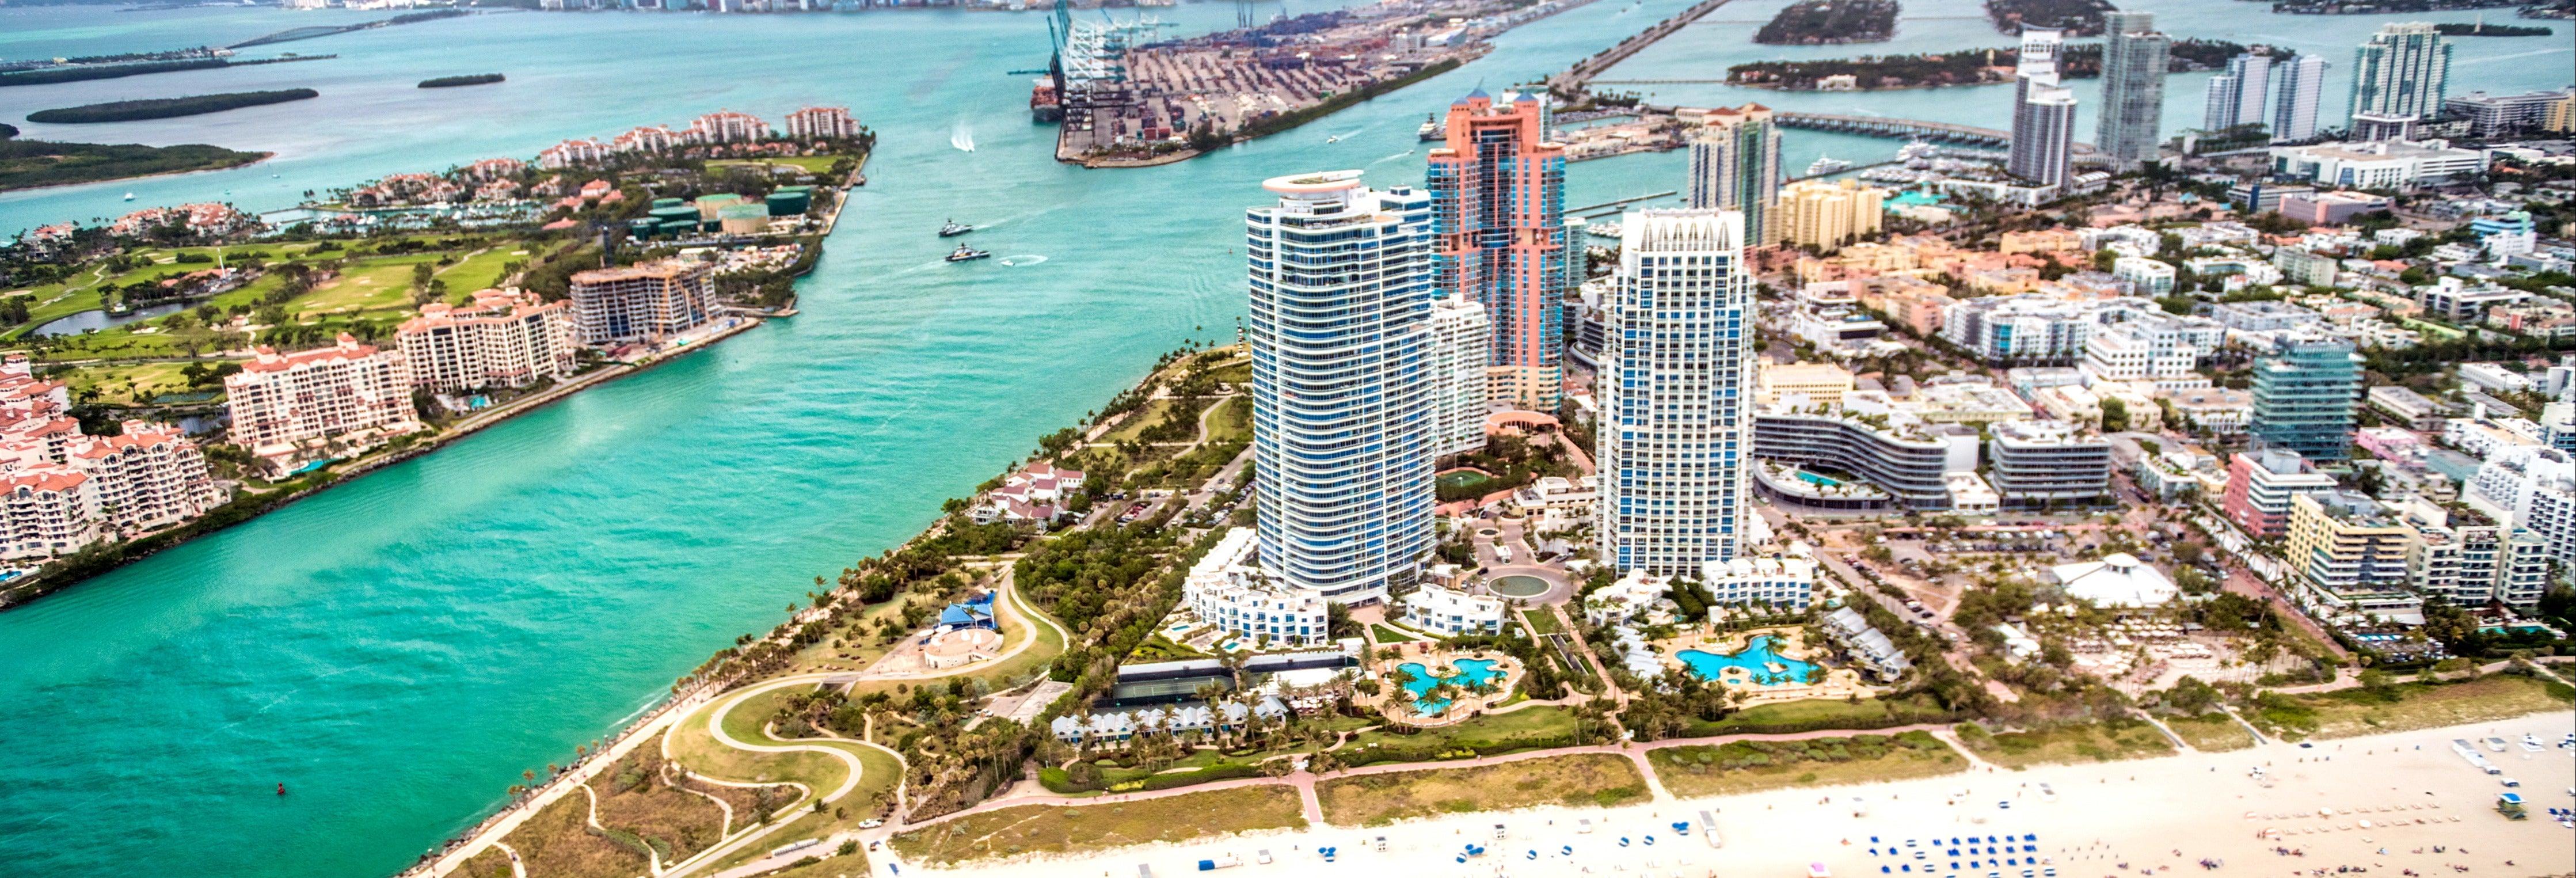 Scalo a Miami? Tour dall'aeroporto